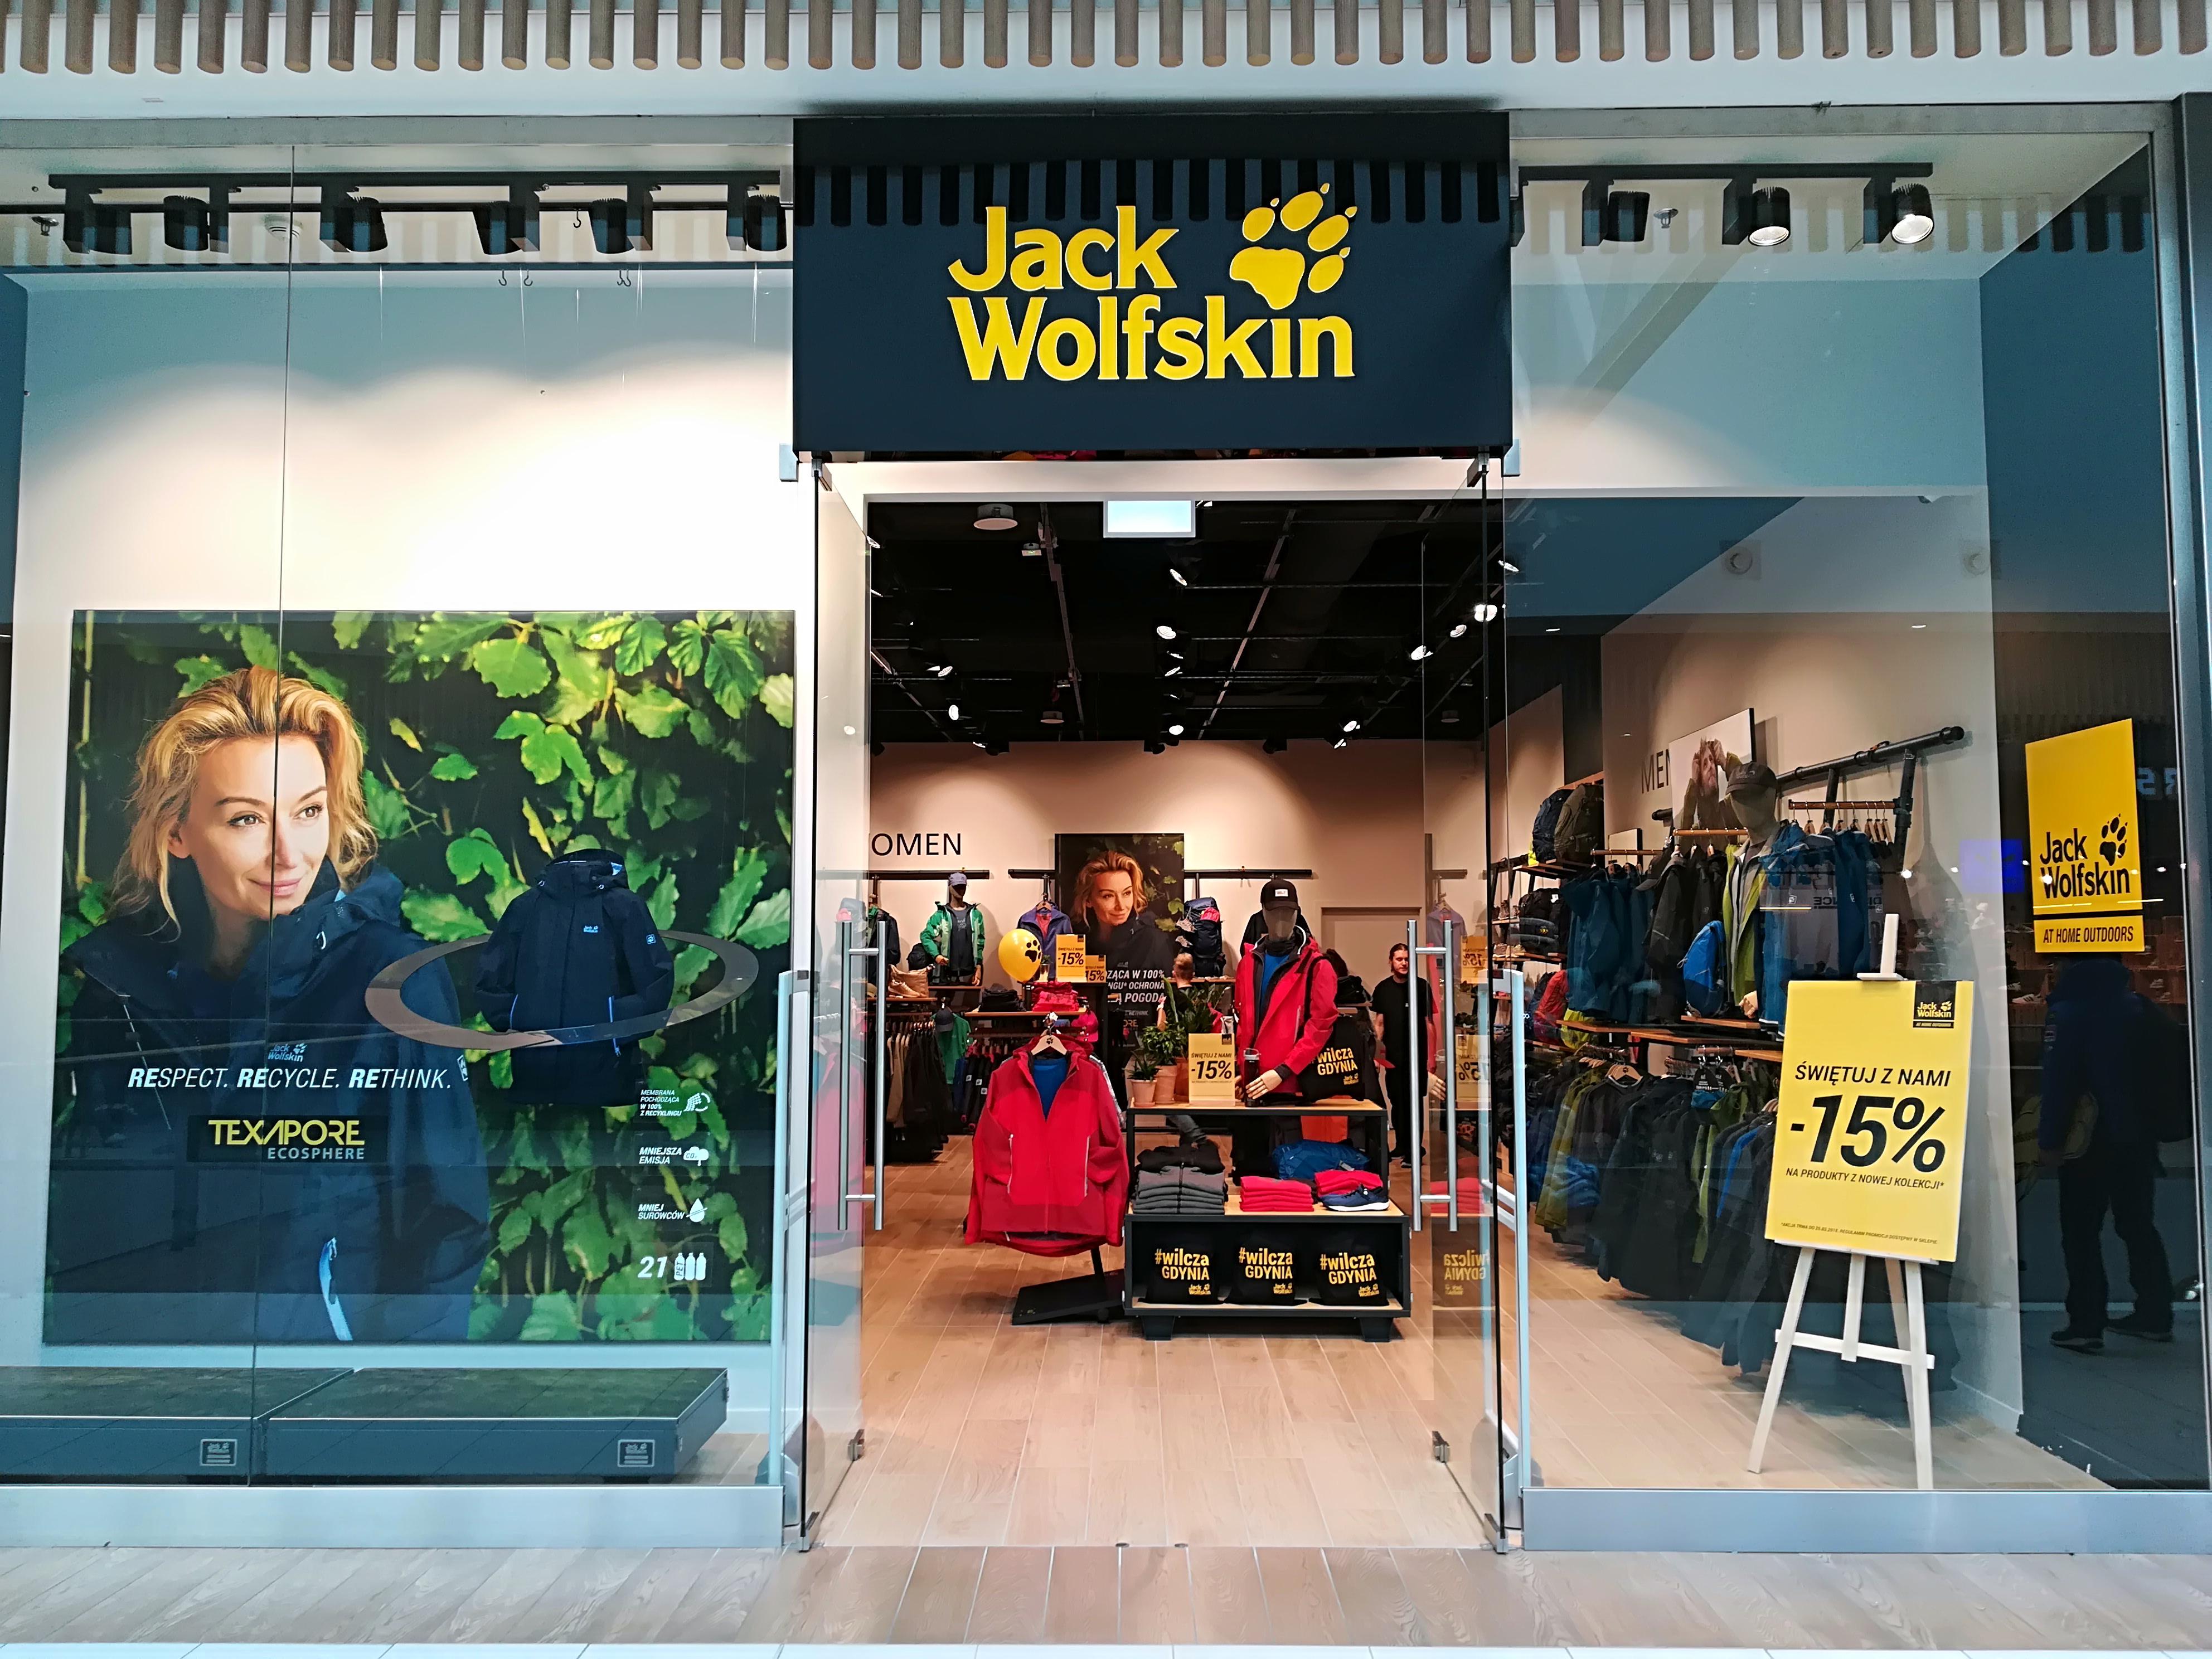 d2d5df8ec48a5b Nowy salon marki Jack Wolfskin w Gdyni